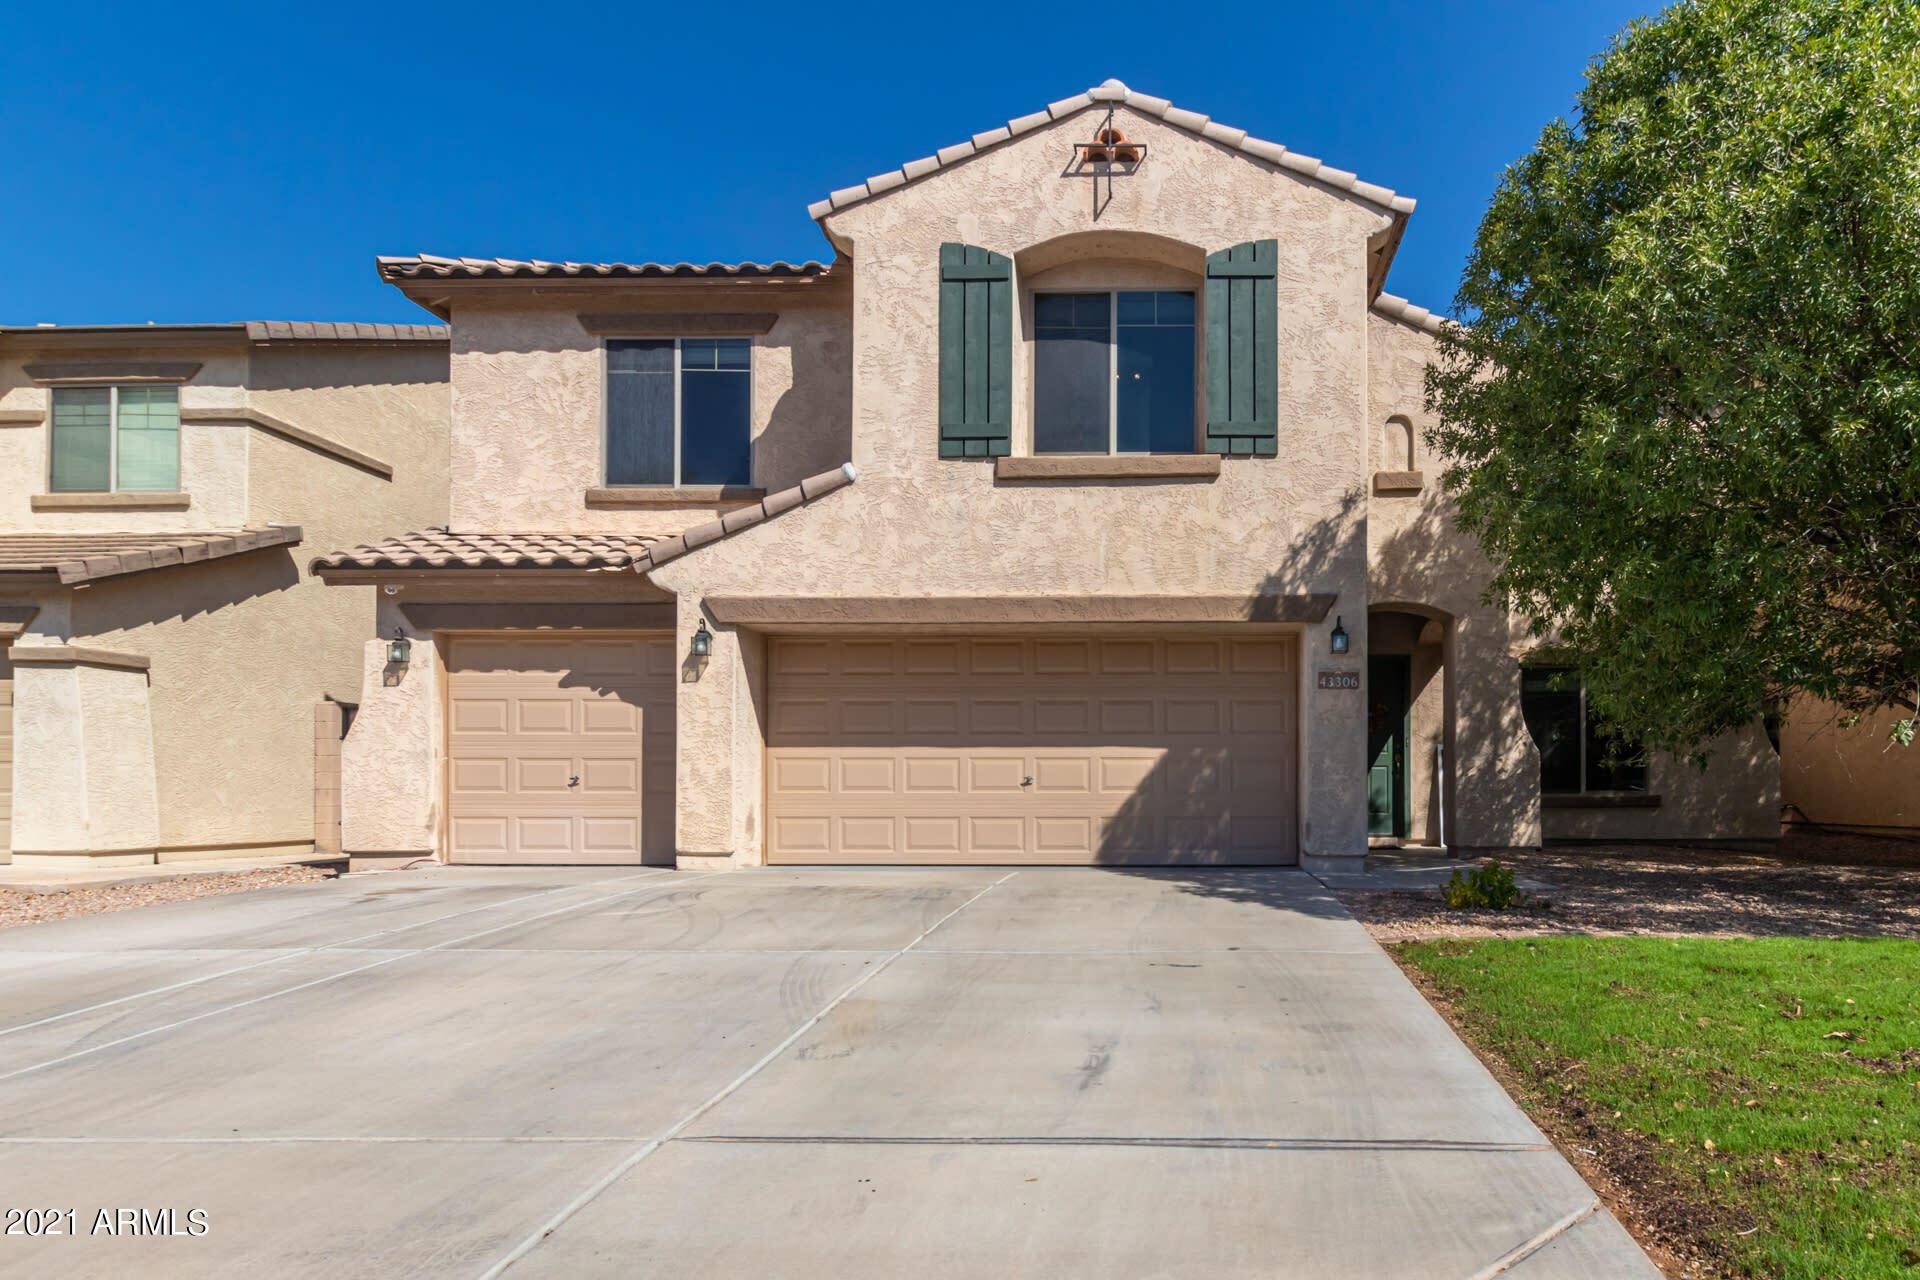 Photo for 43306 W MARICOPA Avenue, Maricopa, AZ 85138 (MLS # 6298363)